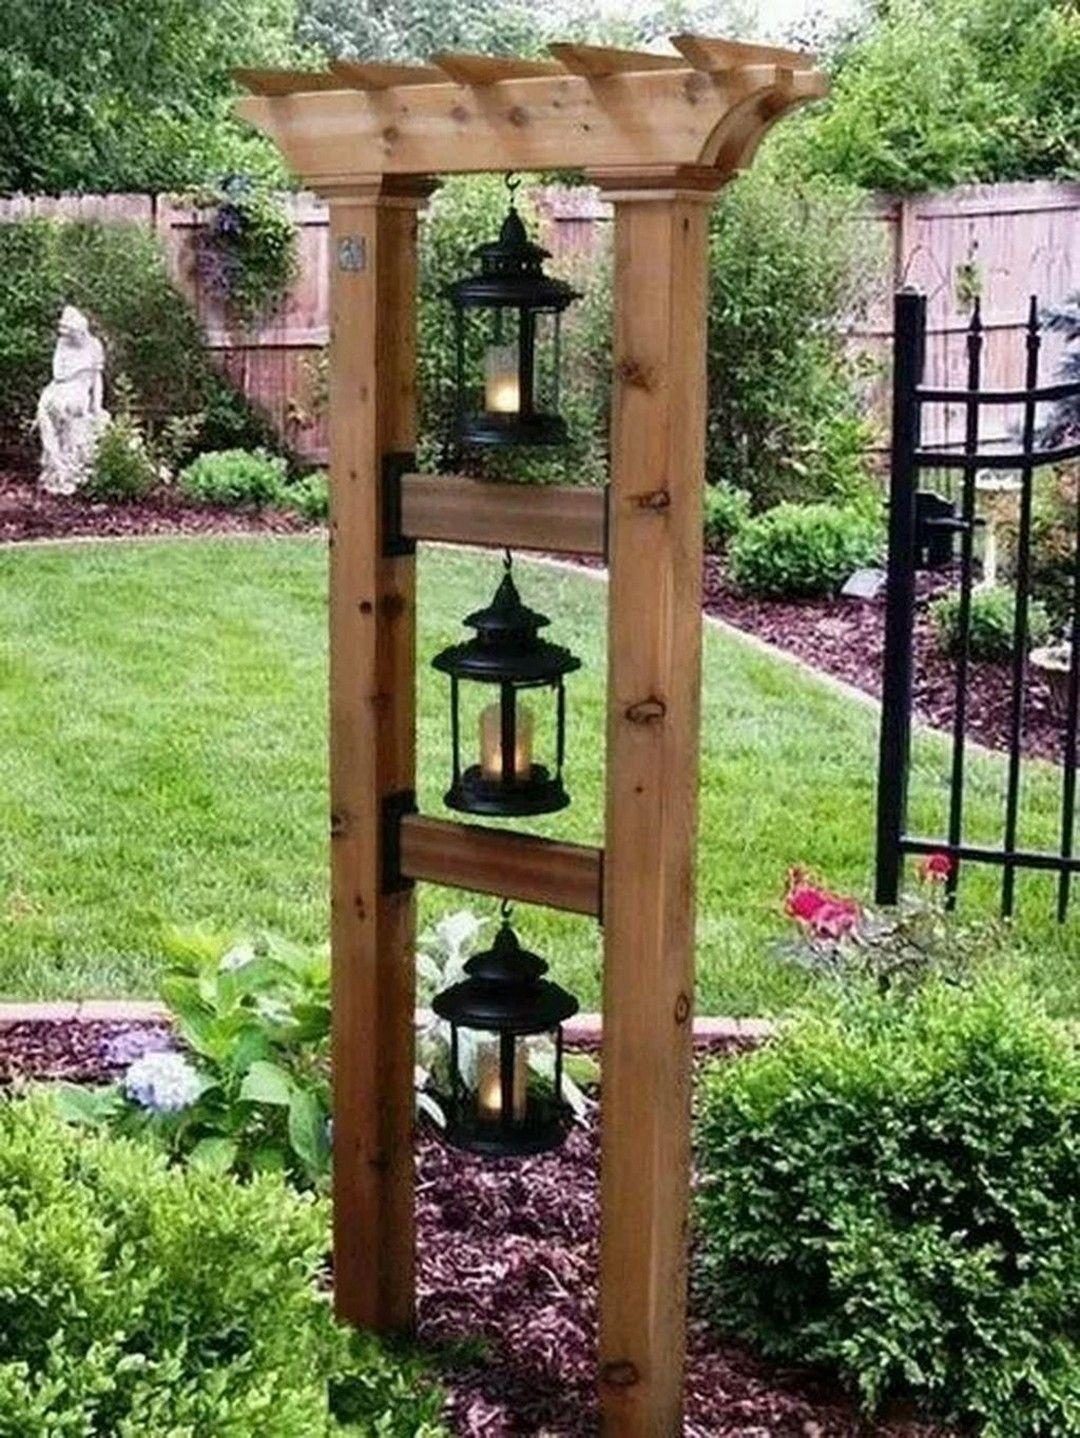 Best Diy Garden Decor & Diy Projects in 2019